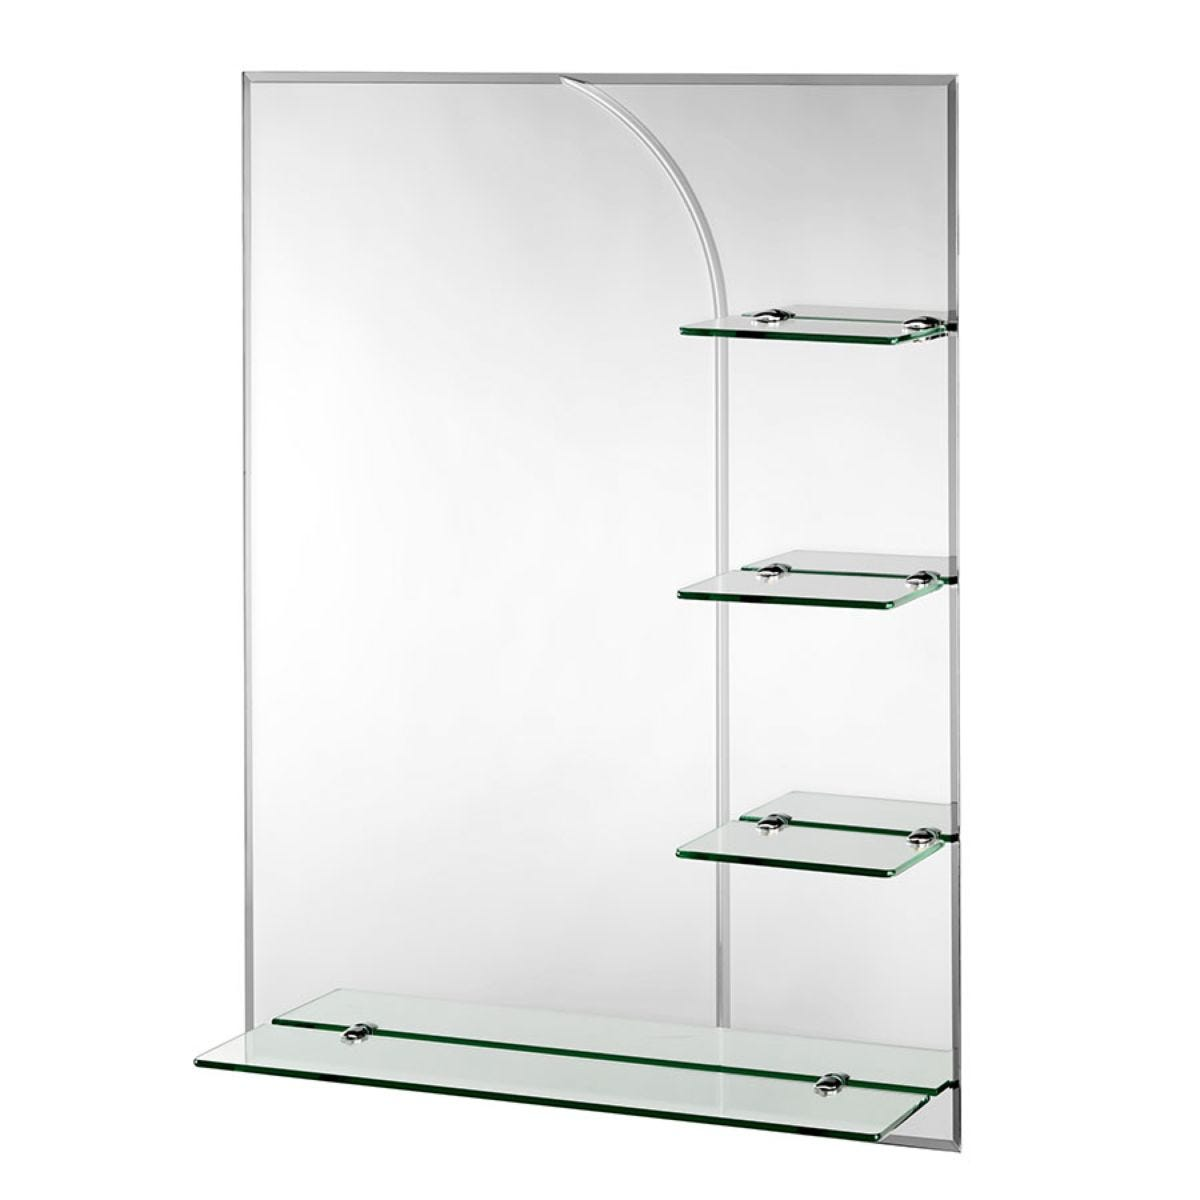 Croydex Bampton Rectangular Mirror with Shelves